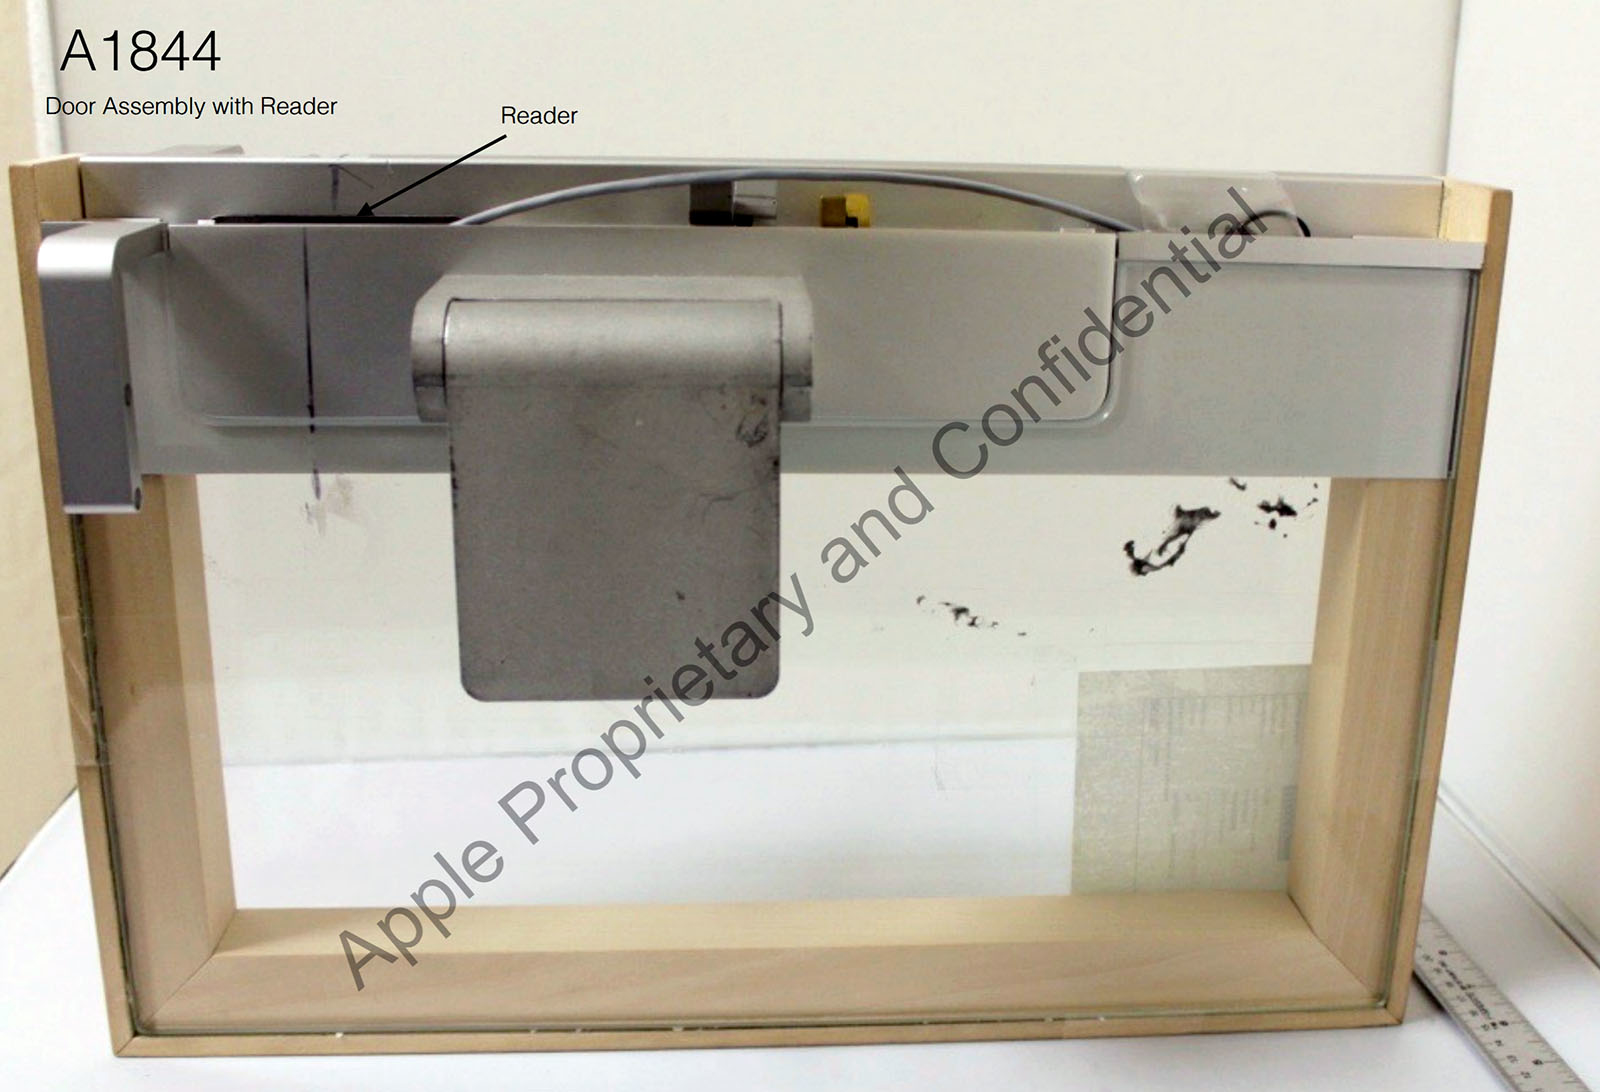 mysteri ses apple gadget ist ein transponderschloss engadget deutschland. Black Bedroom Furniture Sets. Home Design Ideas